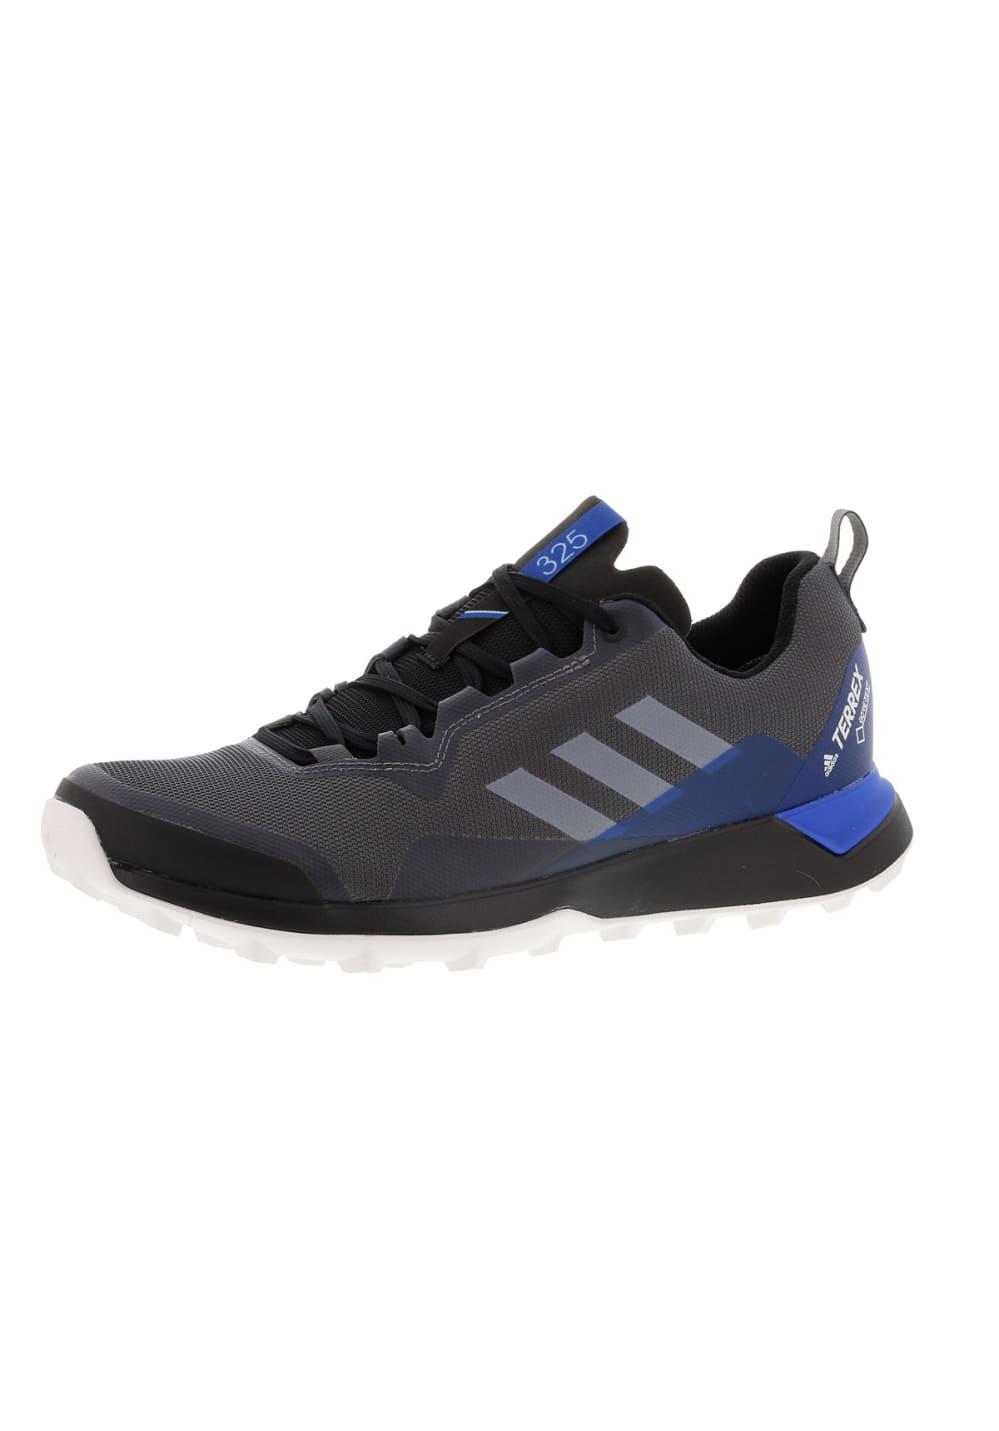 Terrex Gtx Chaussures Cmtk Homme Randonnée Adidas Gris Pour eIYDEH9W2